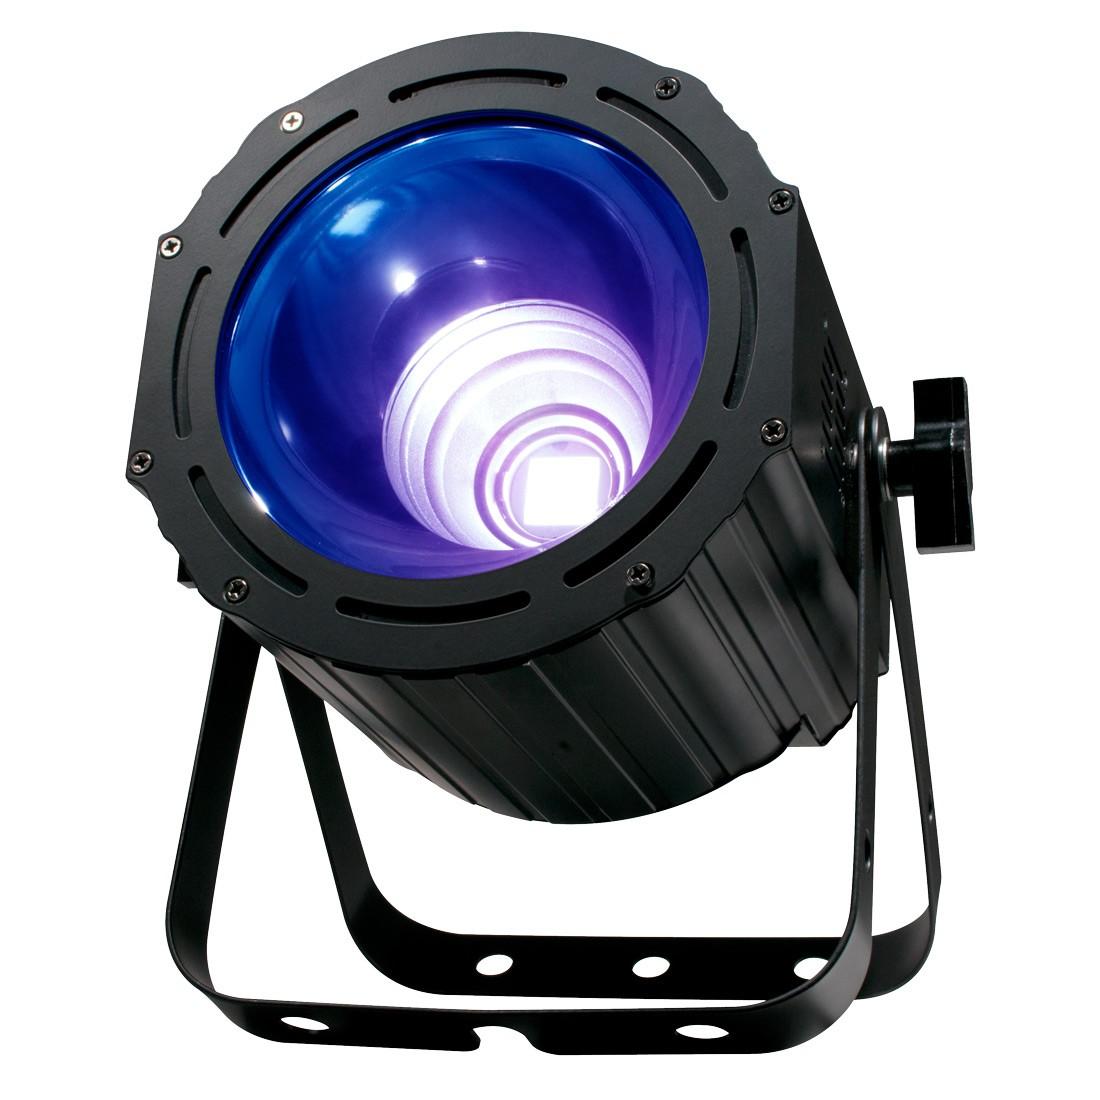 UV COB CANON - COB - LED Lighting - Lights - Products - ADJ Group